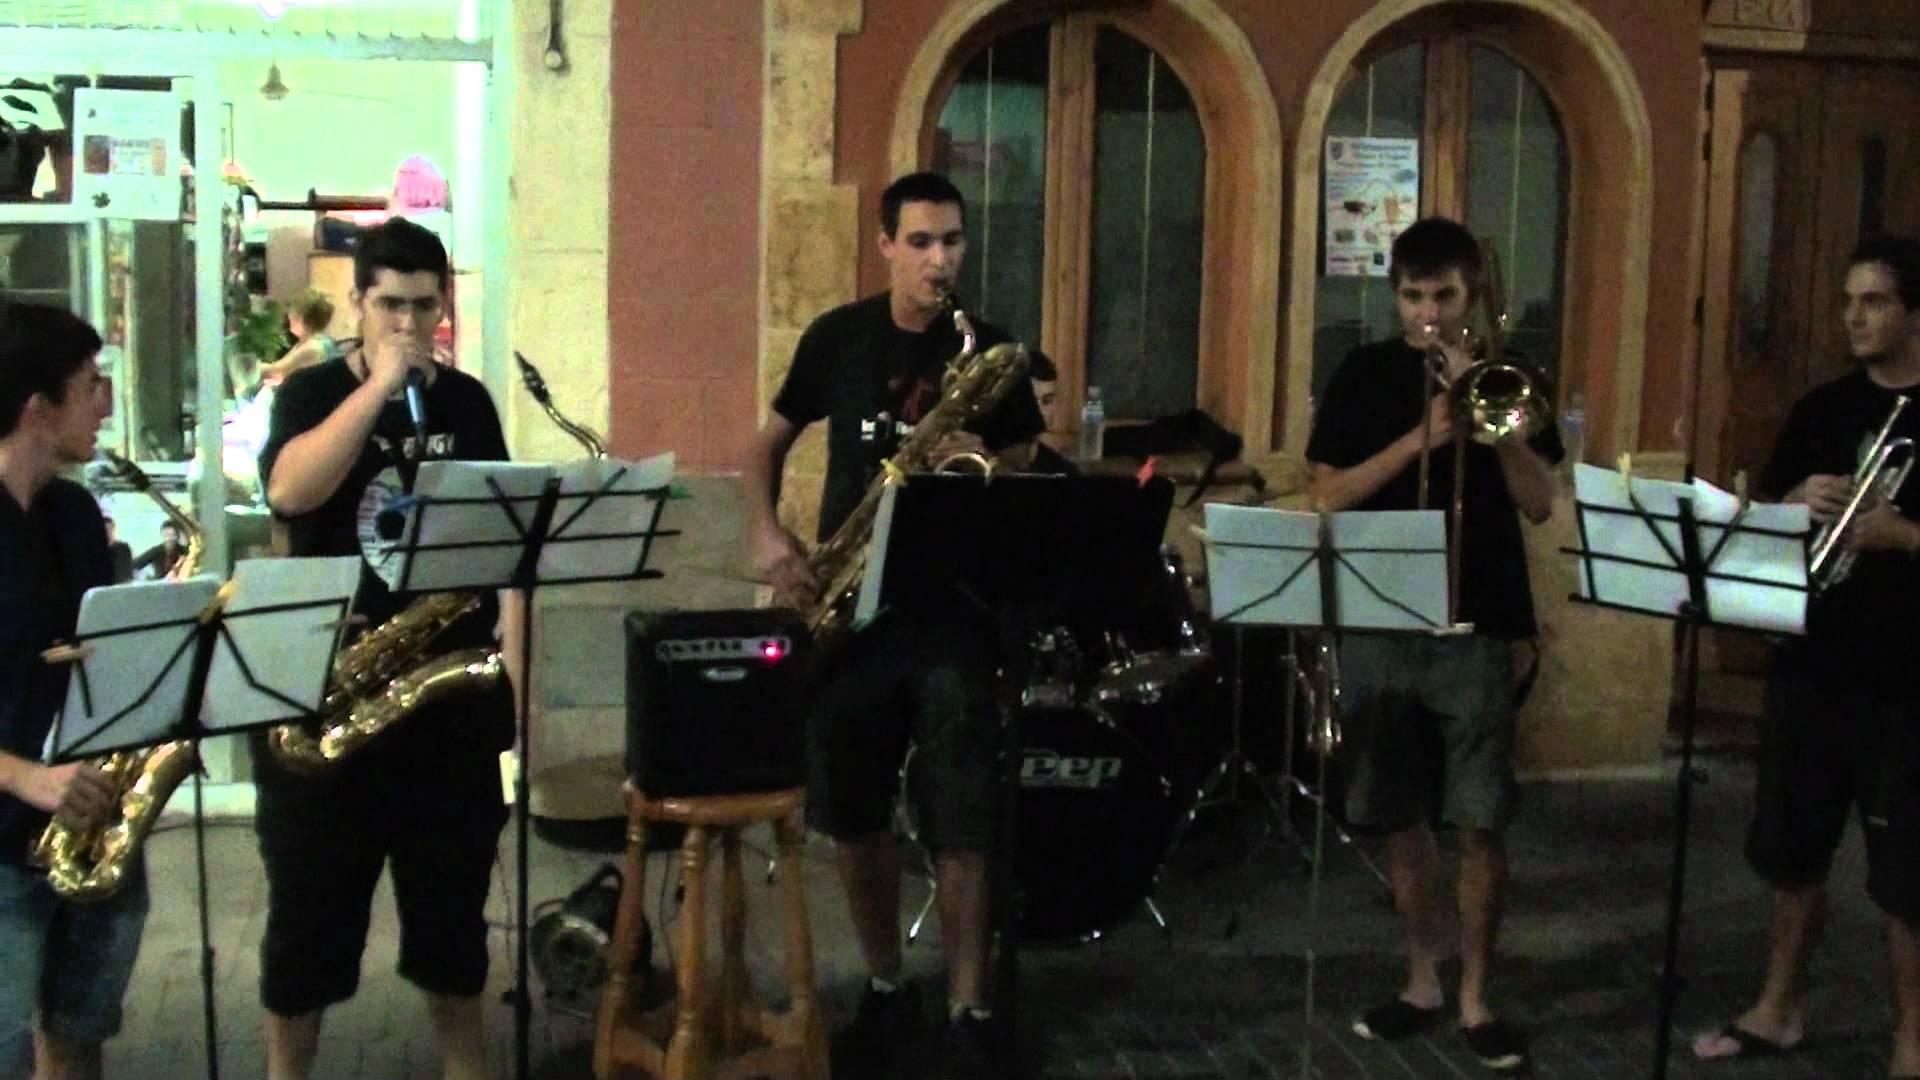 I Festival Estiu de Jazz – 17 al 20 de Julio 2014 en Calpe (Costa Blanca), Mario Schumacher Blog